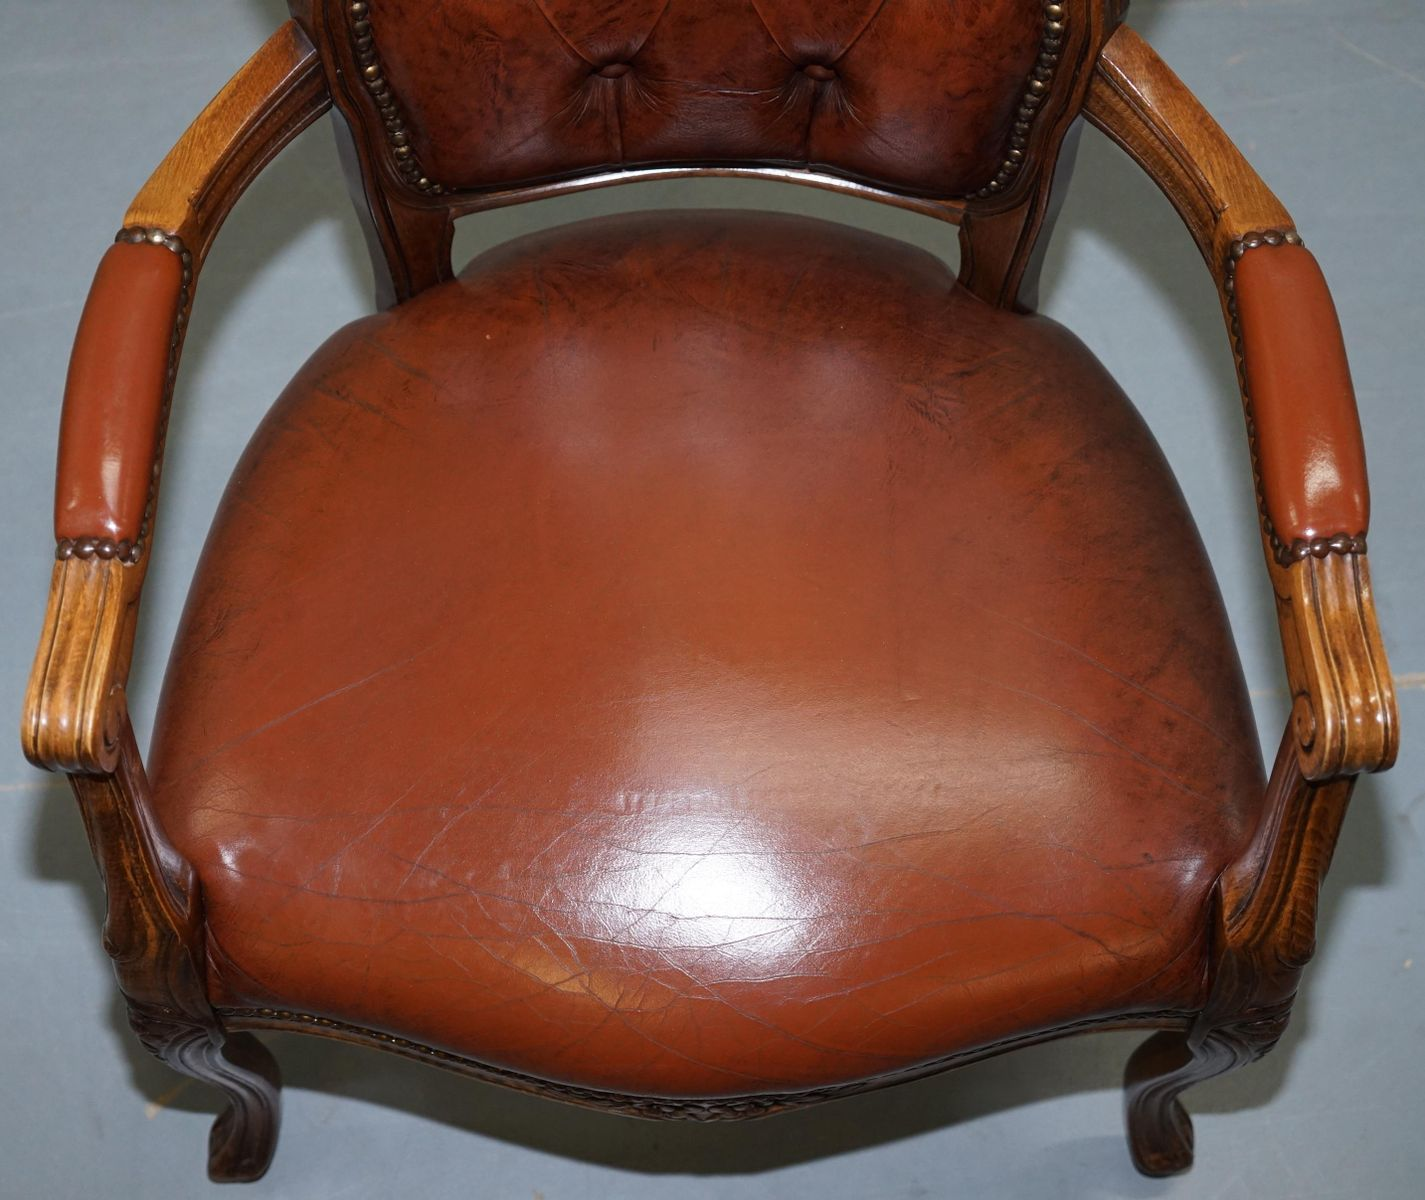 fauteuil style louis xvii en cuir marron chesterfield. Black Bedroom Furniture Sets. Home Design Ideas